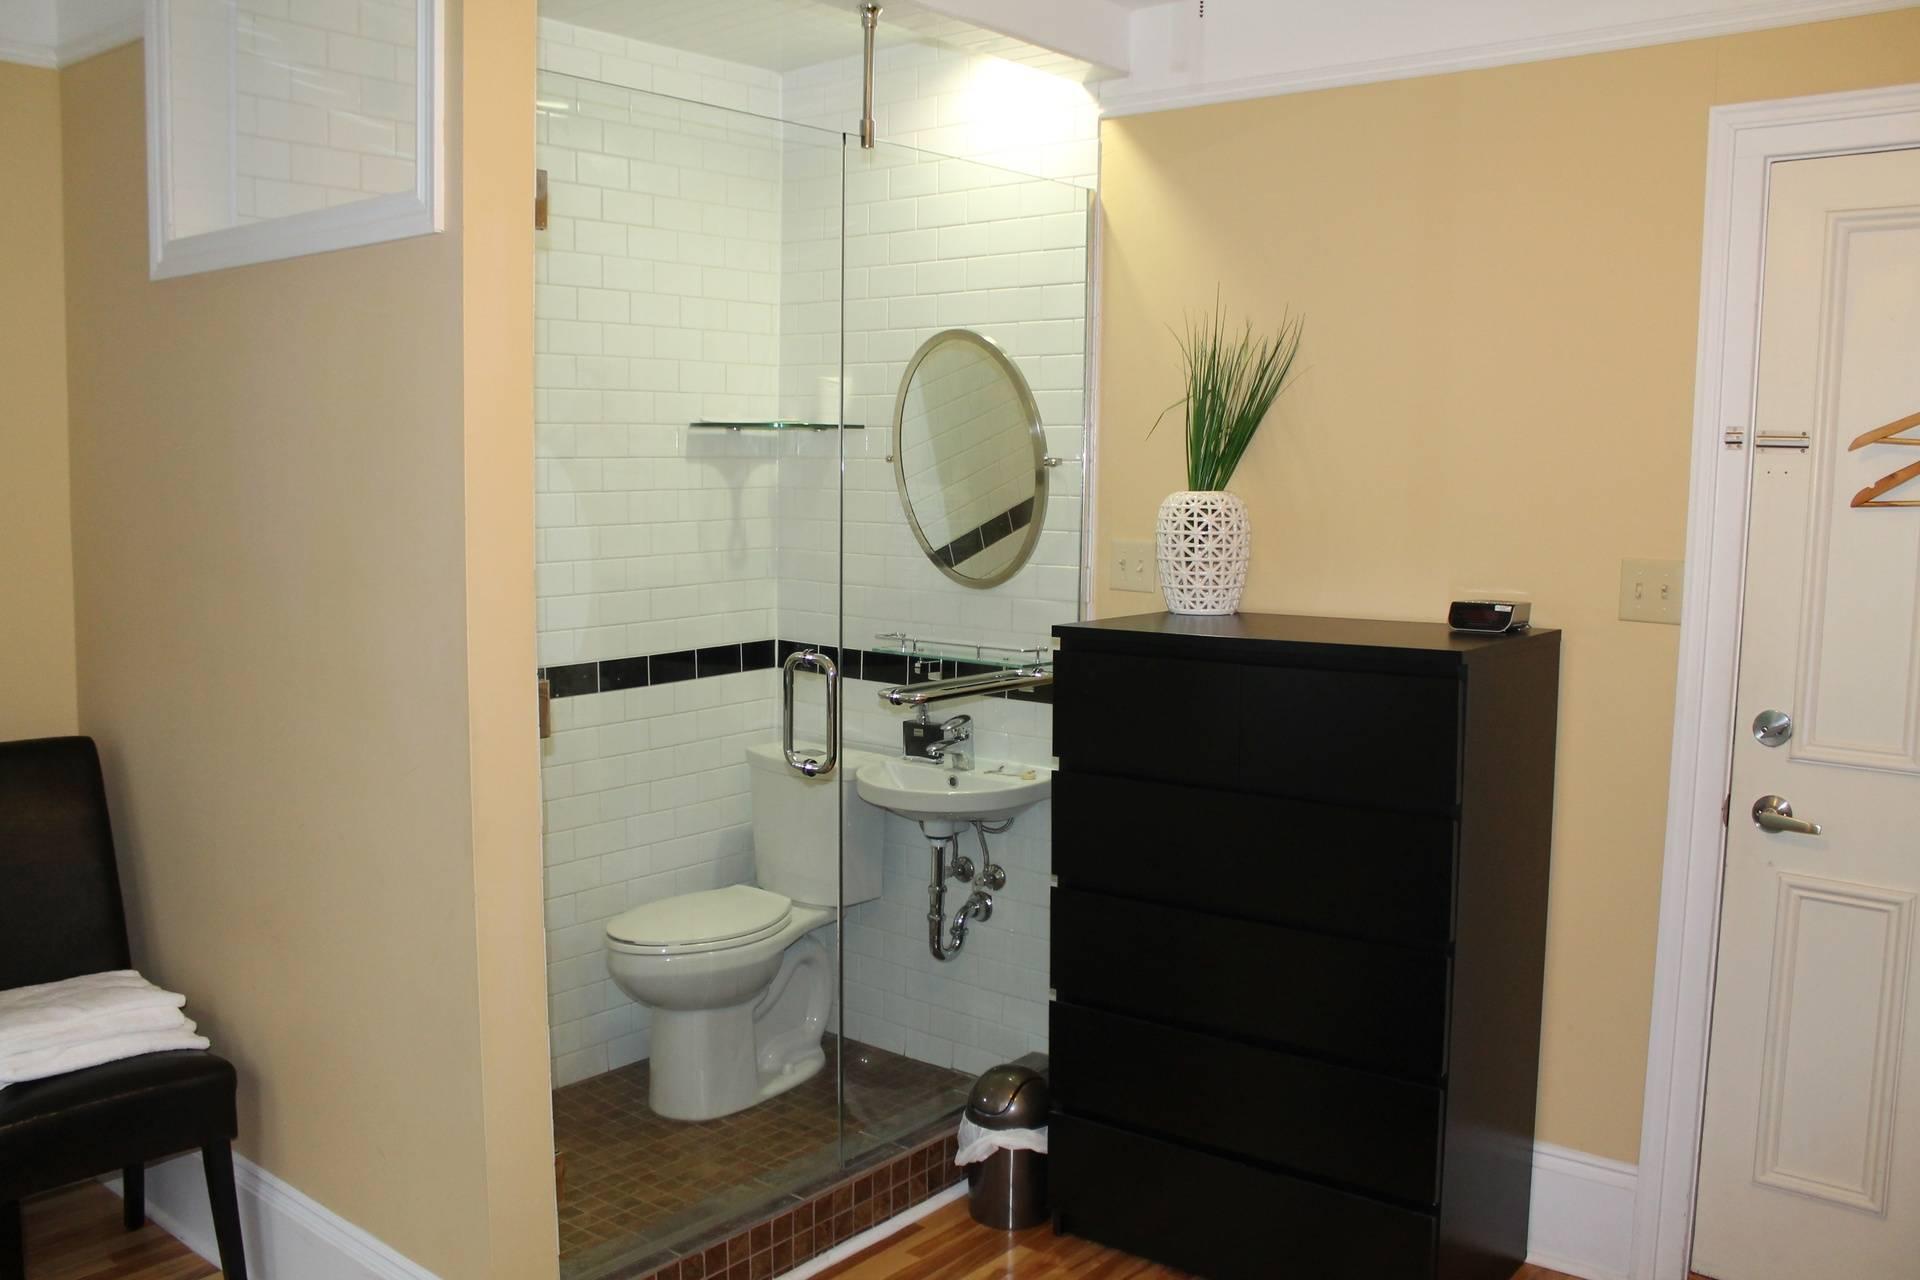 larger bathroom area